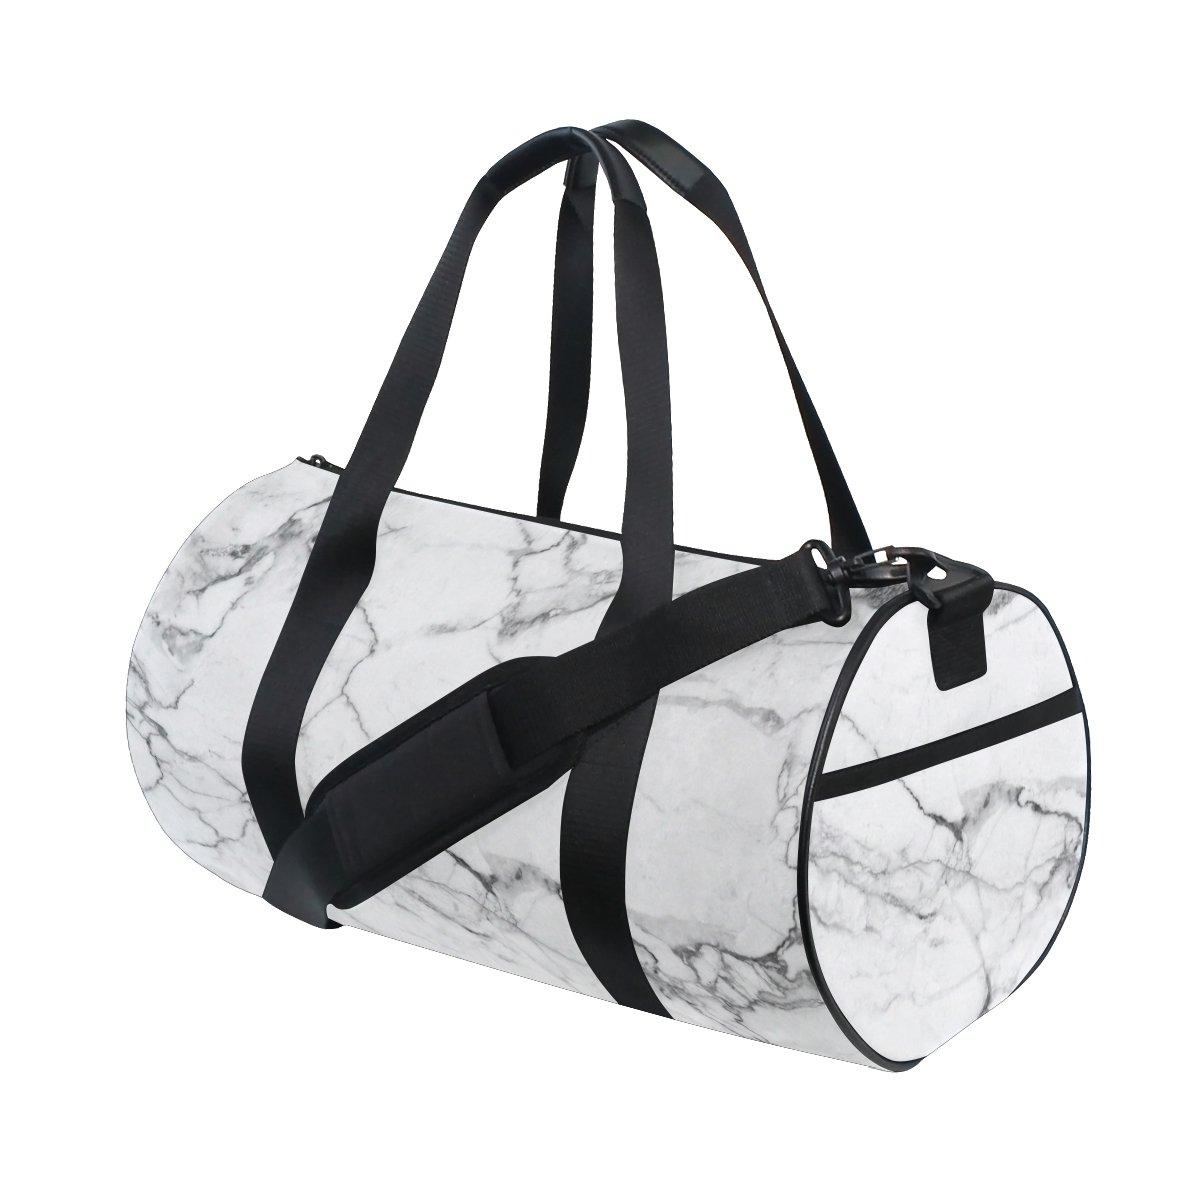 dfc586d64cf Amazon.com   Naanle White Marble Pattern Gym bag Sports Travel Duffle Bags  for Men Women Boys Girls Kids   Sports Duffels